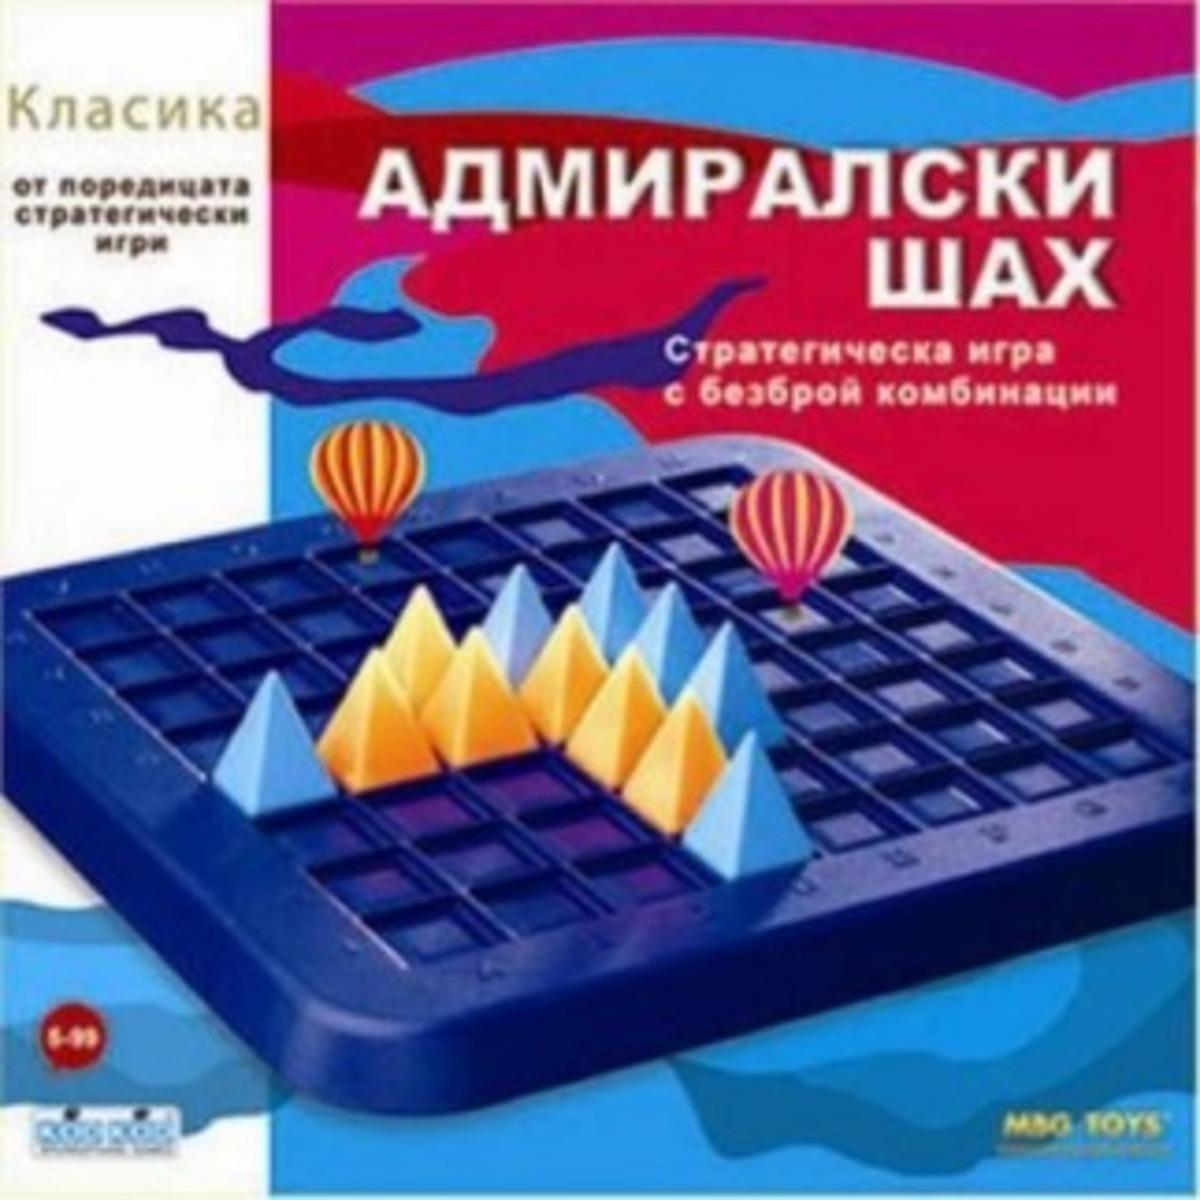 Адмиралски шах